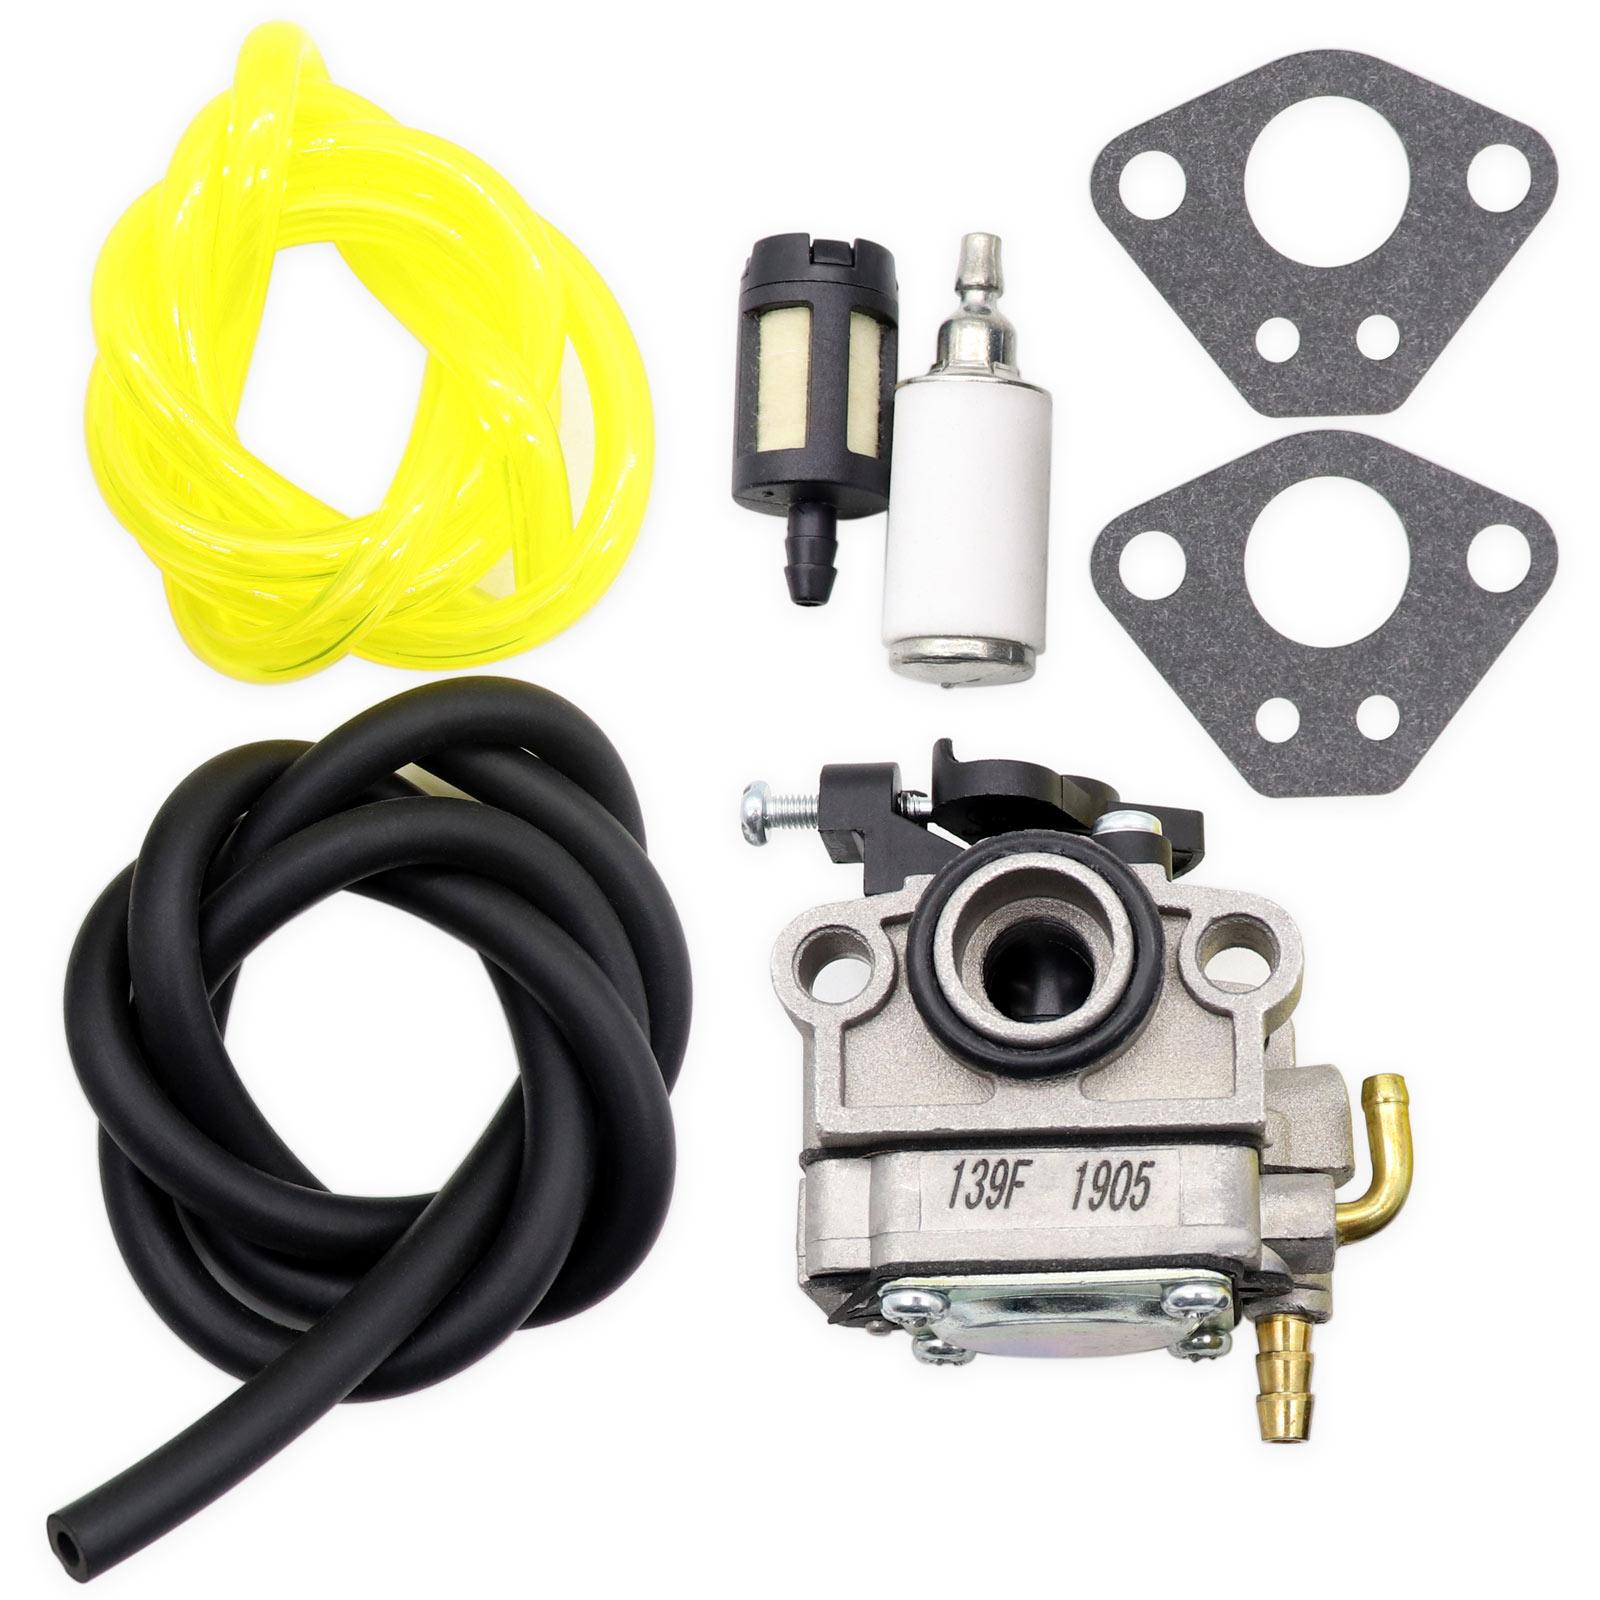 Carburetor fit for Craftsman 30CC 4-CYCLE Gas Trimmer Weedwacker Rep 73197Gasket